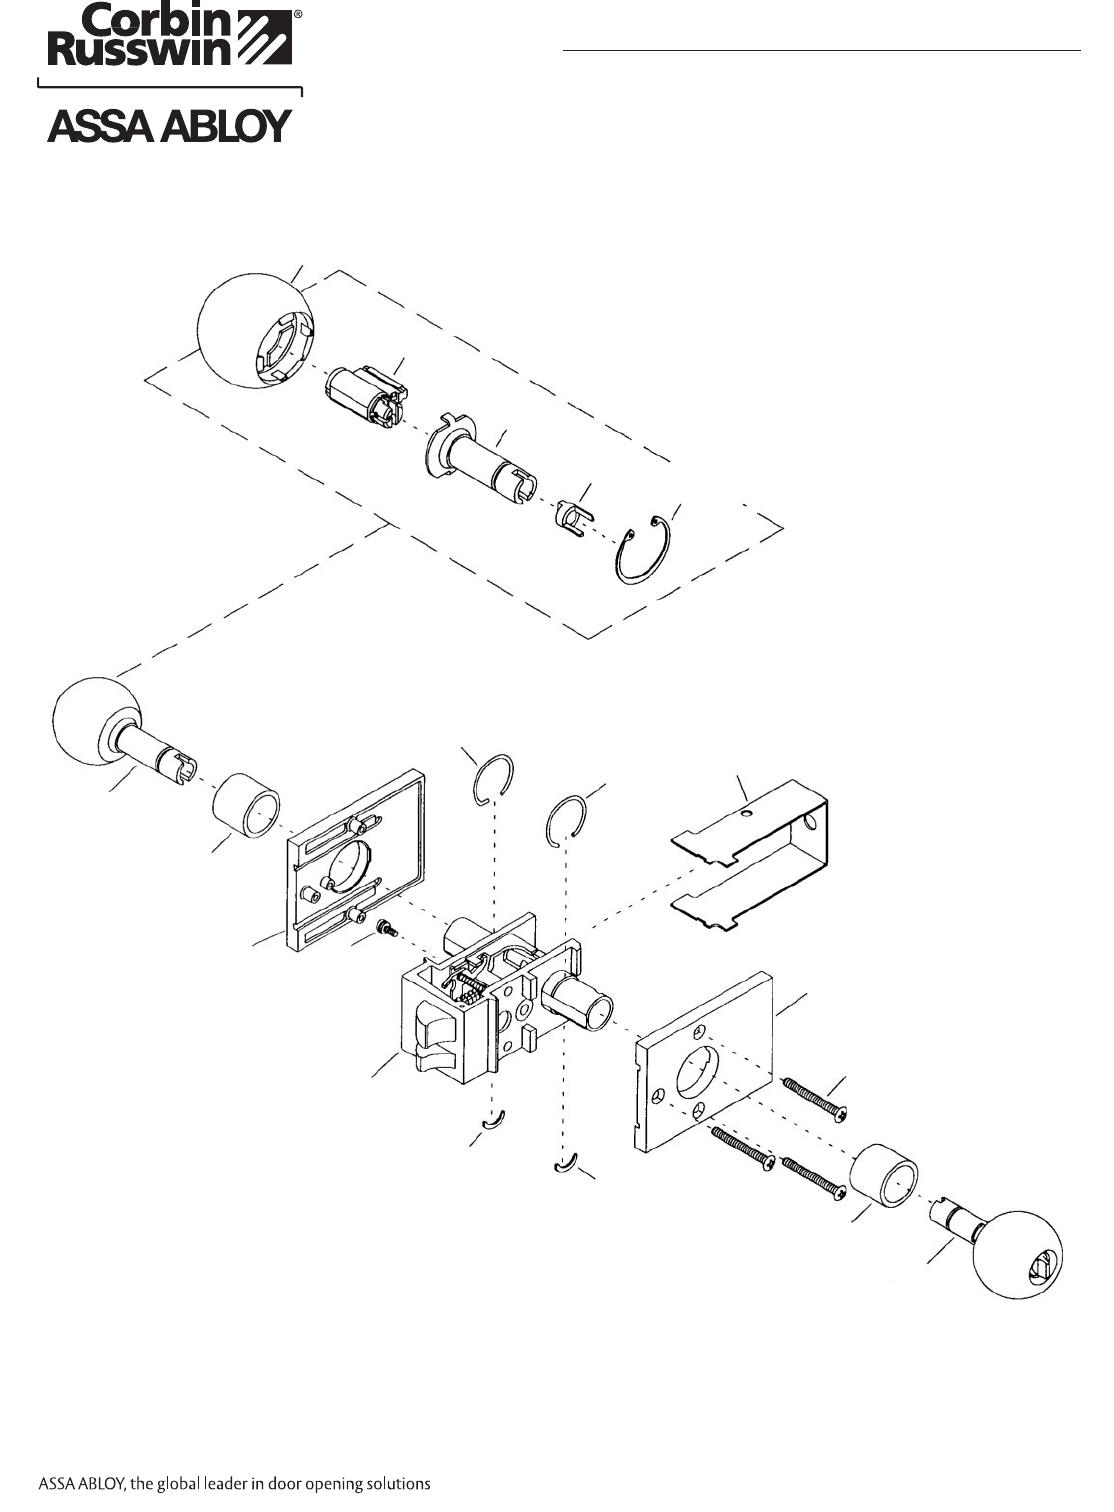 Corbin Russwin 45066 CR ED6000 UT5200 Series Parts Manual